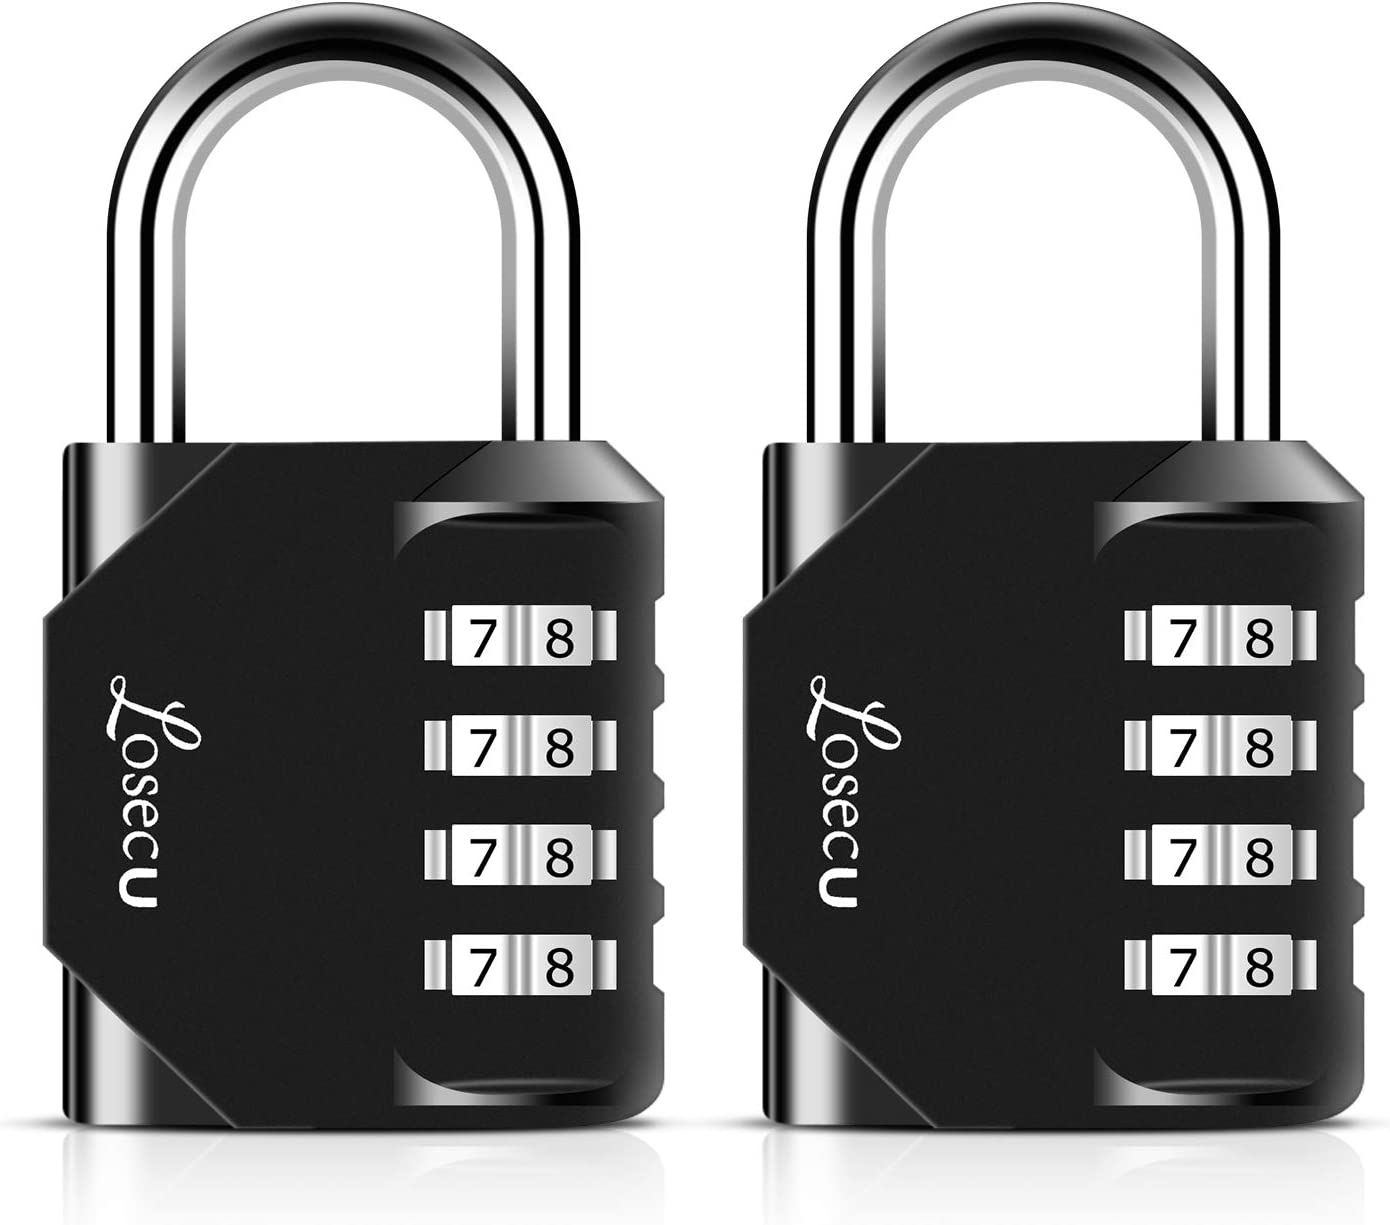 Combination Locks, Losecu 4 Digit Combination Padlock for School Gym Sports Locker, Fence, Toolbox, Case, Hasp Storage, 2 Packs, Black